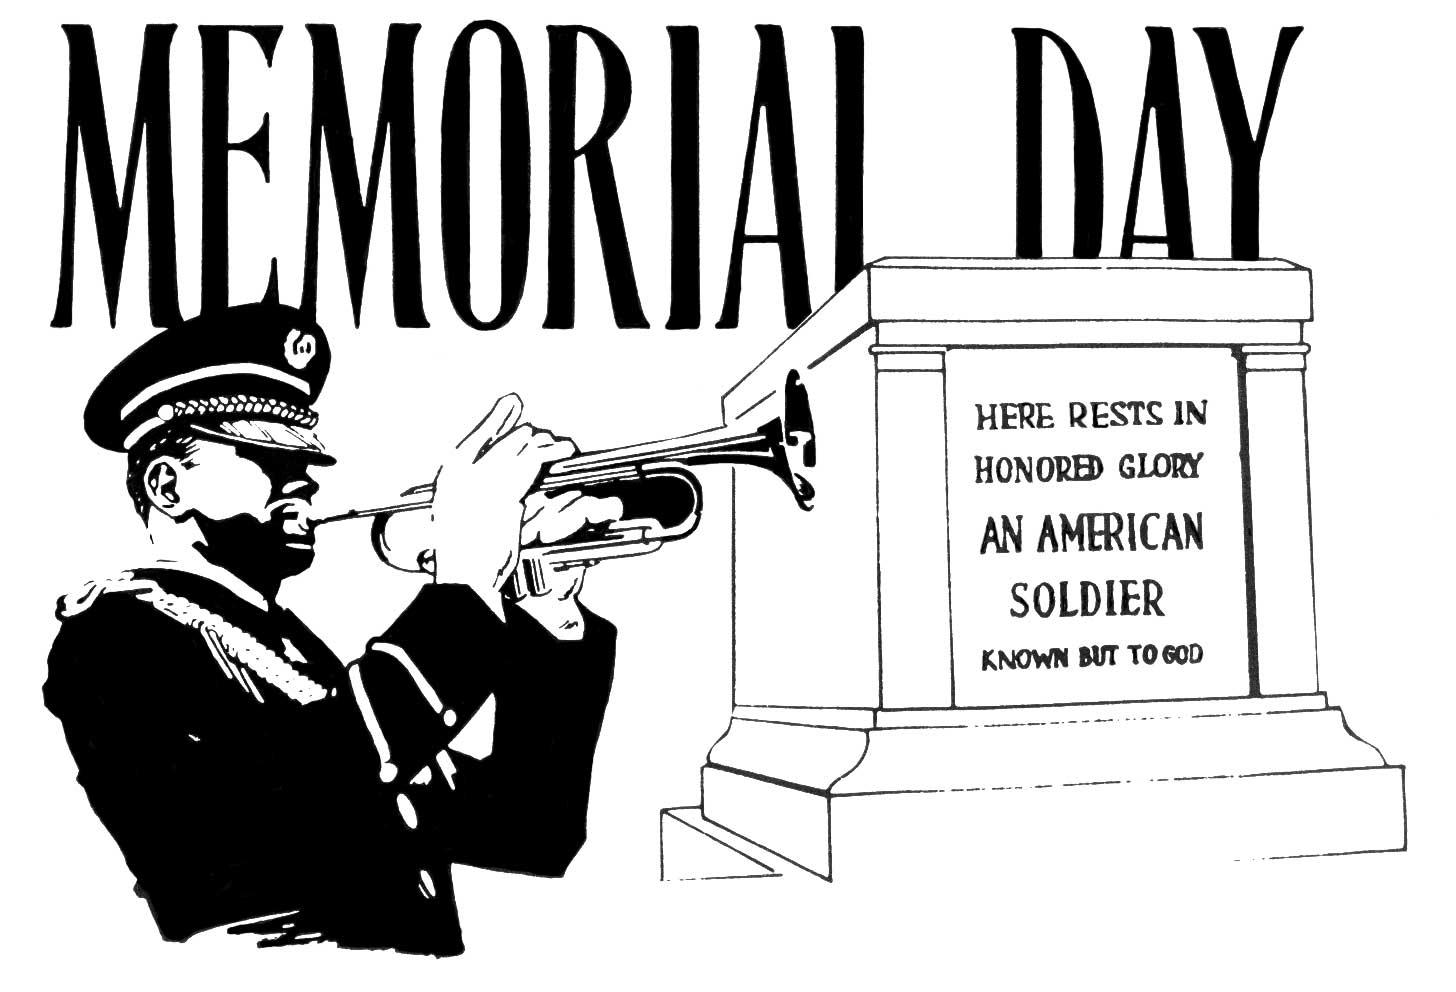 Free Memorial Day Art, Download Free Clip Art, Free Clip